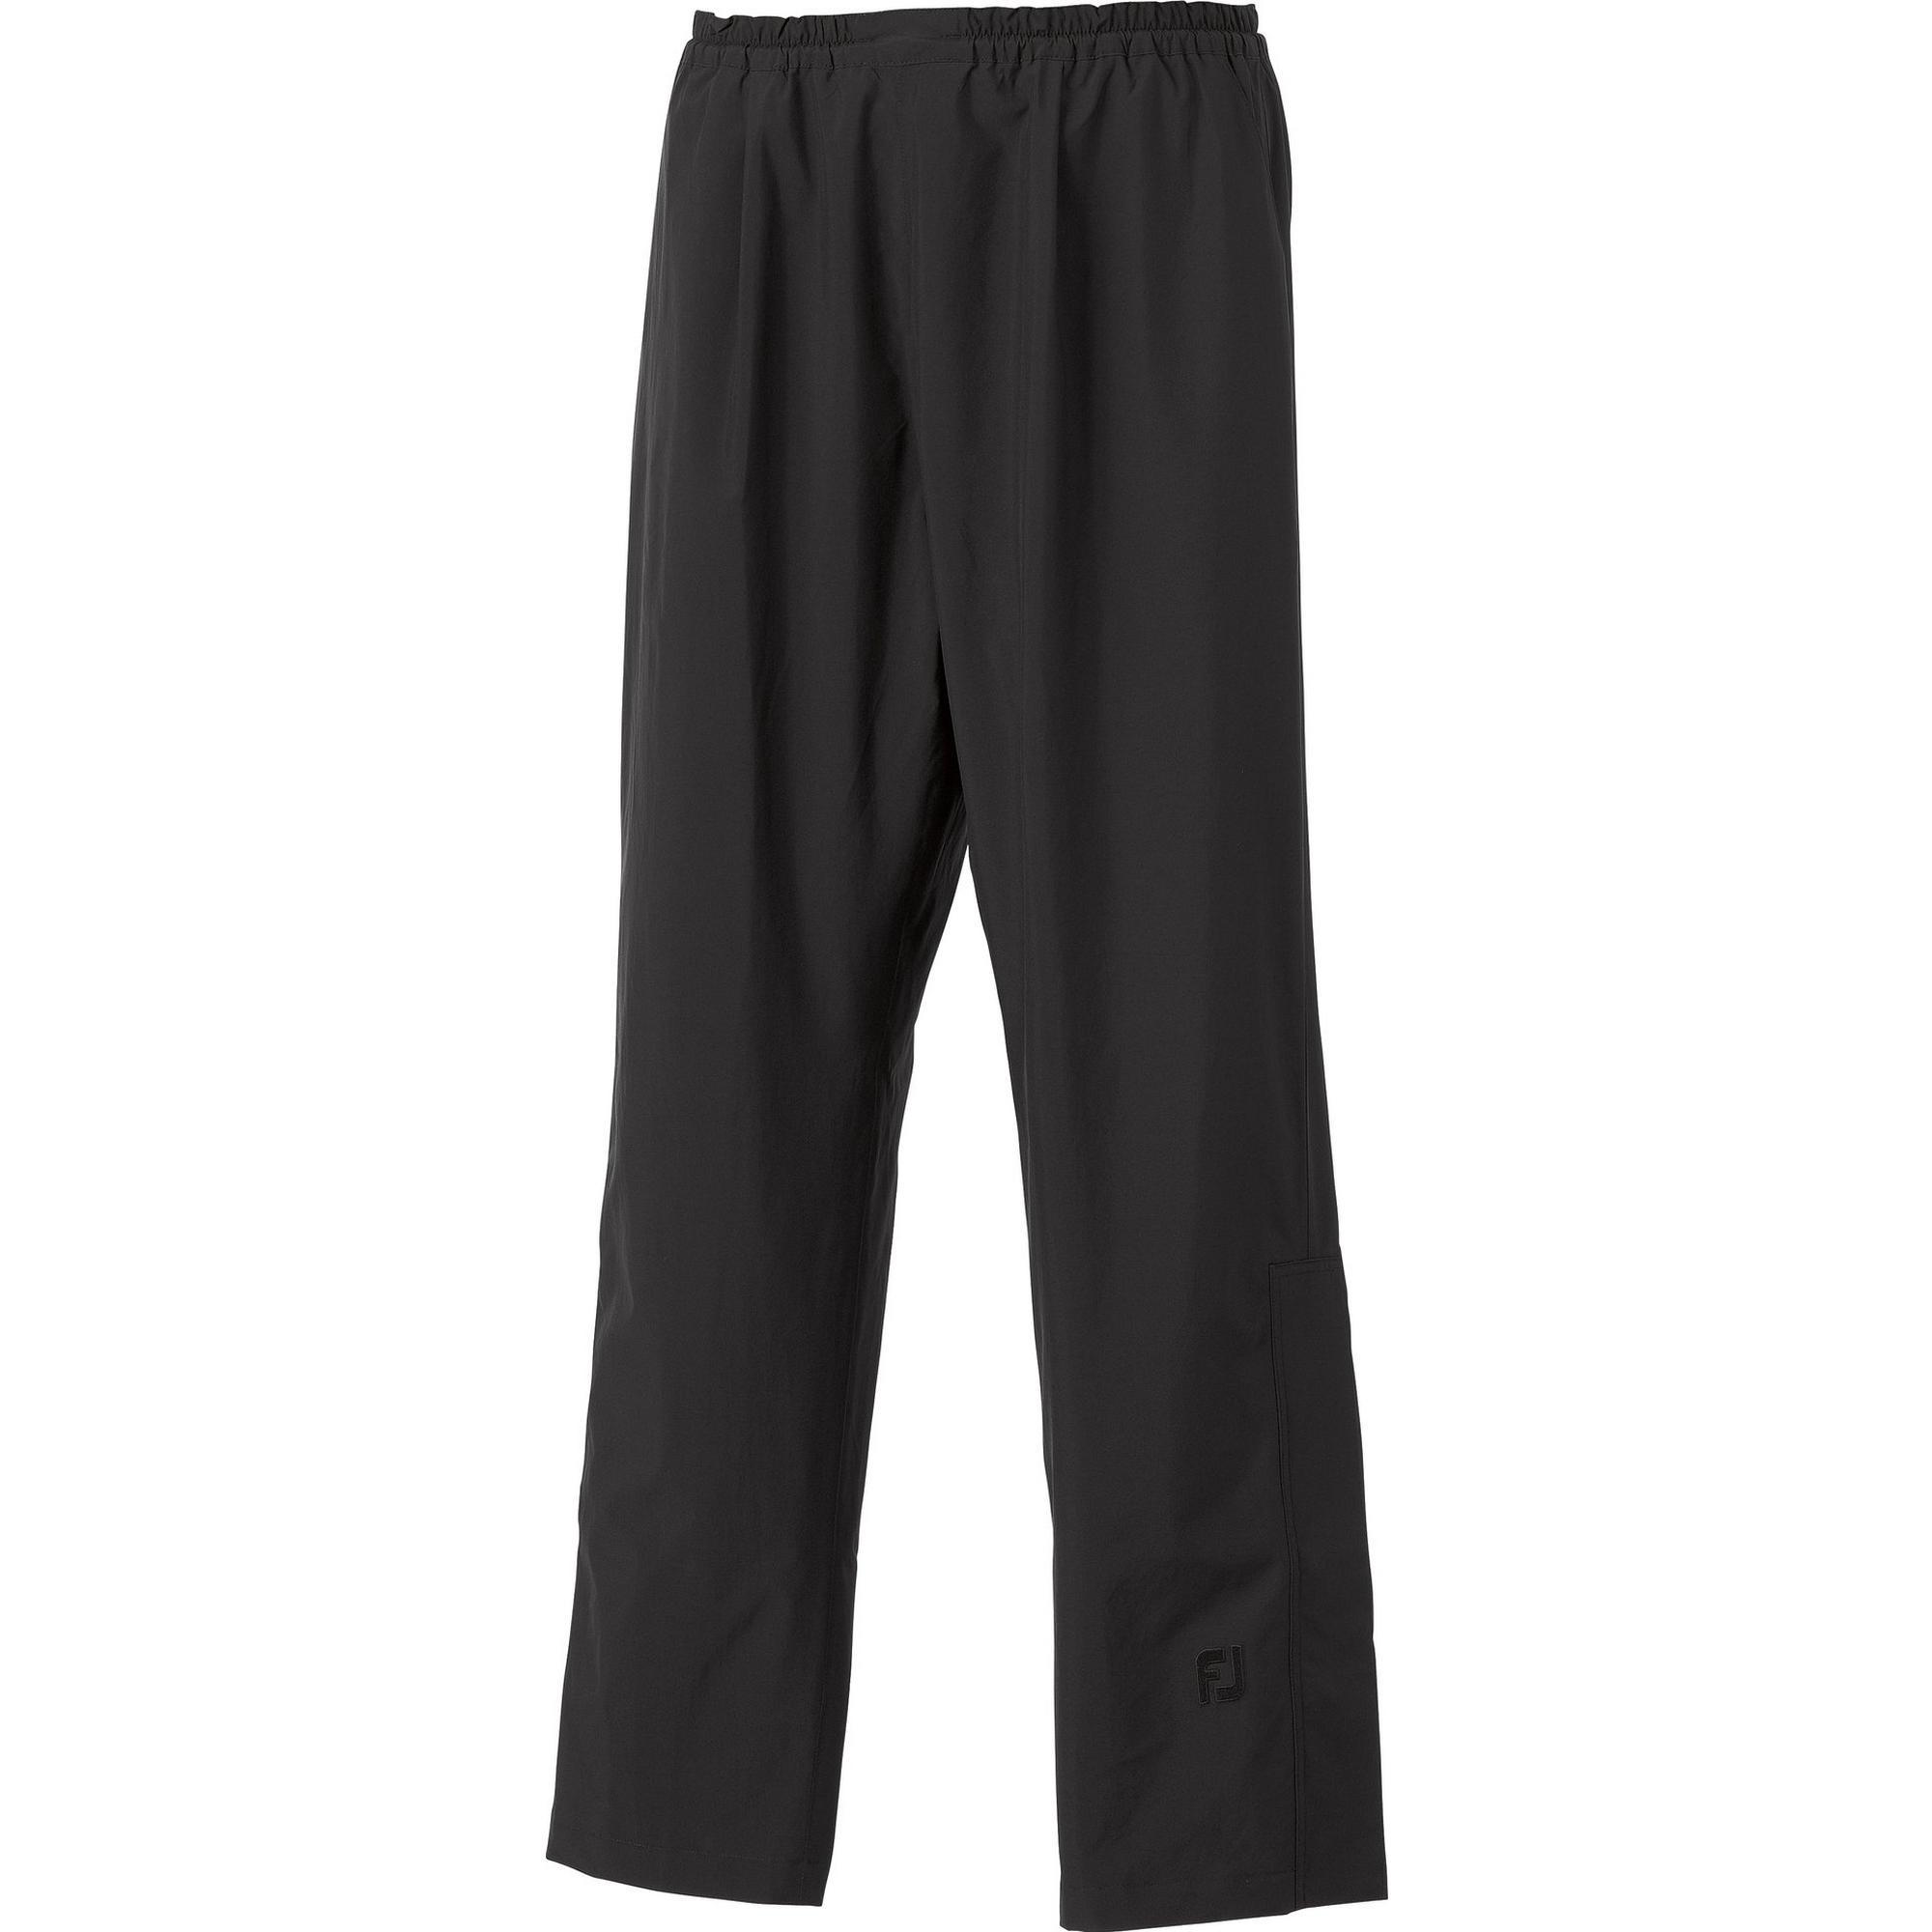 Pantalon DryJoys Performance léger pour hommes